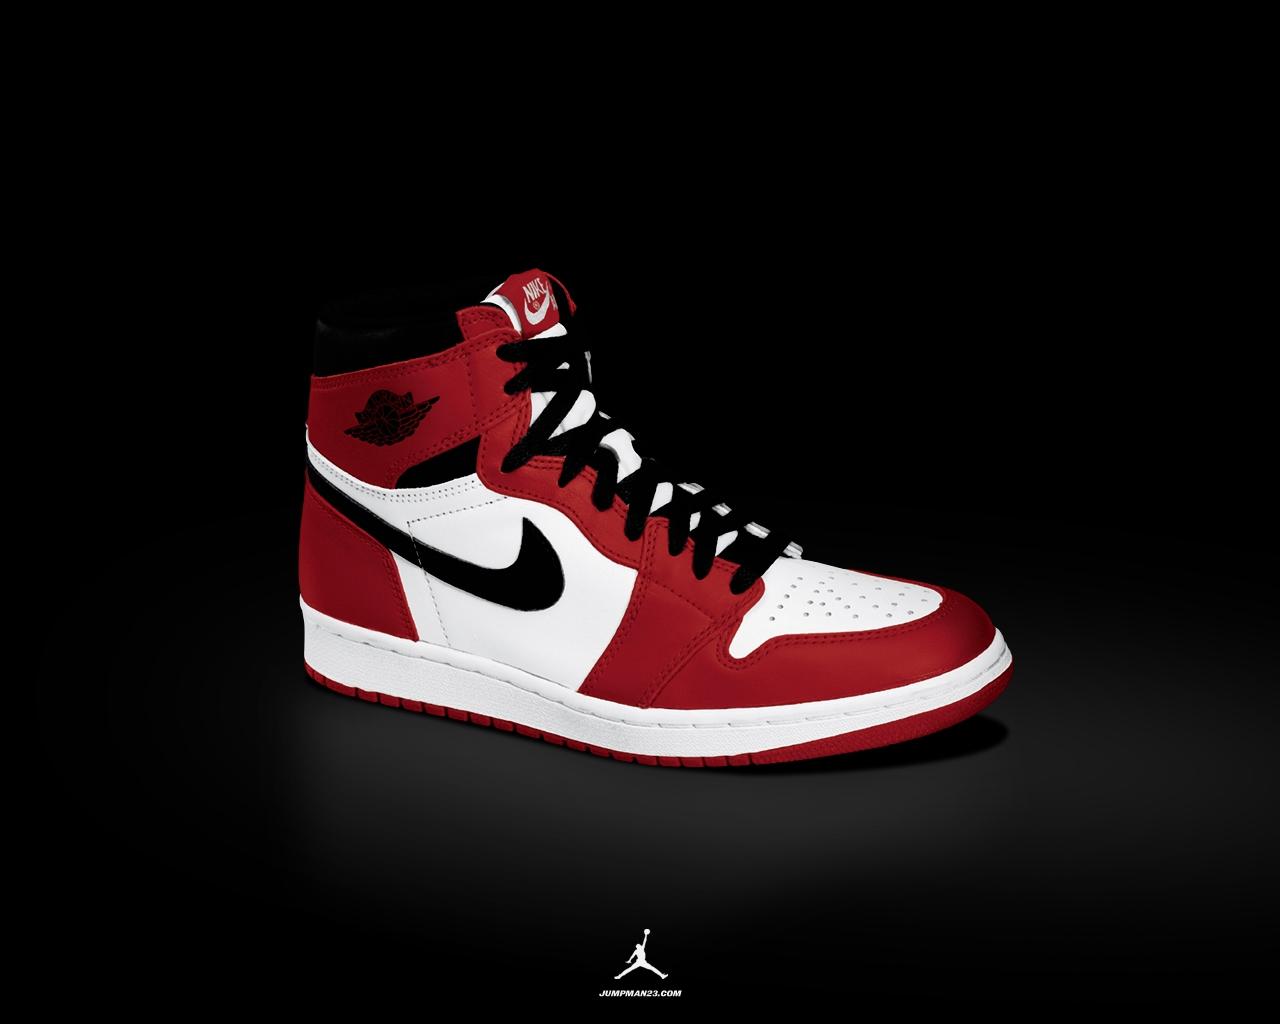 Free Download Pics Photos Air Jordan Wallpaper 1280x1024